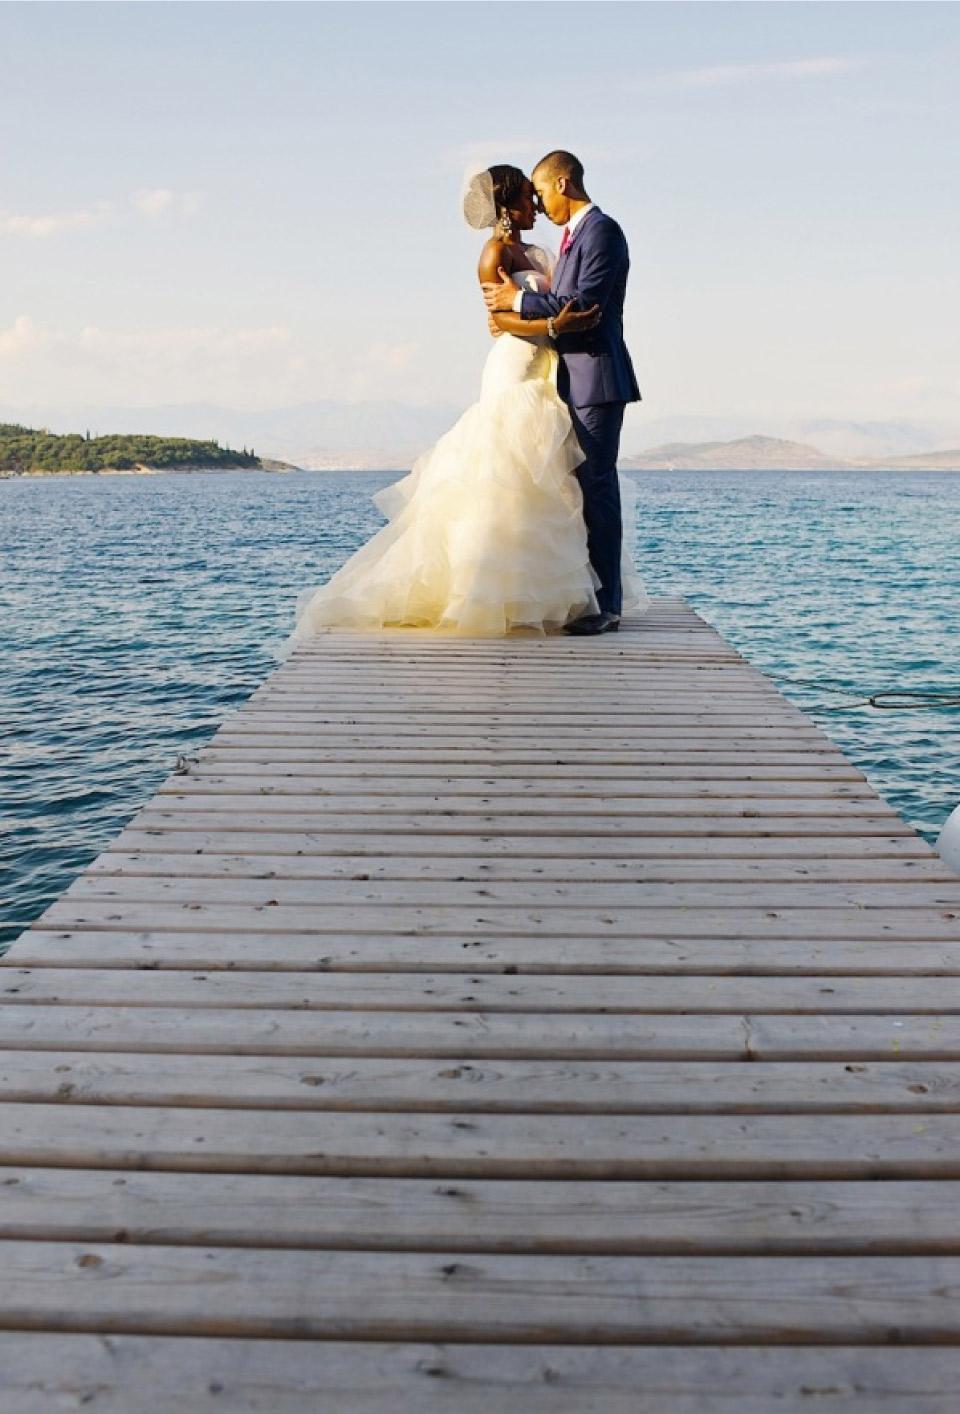 Wedding planner à Genève en Suisse